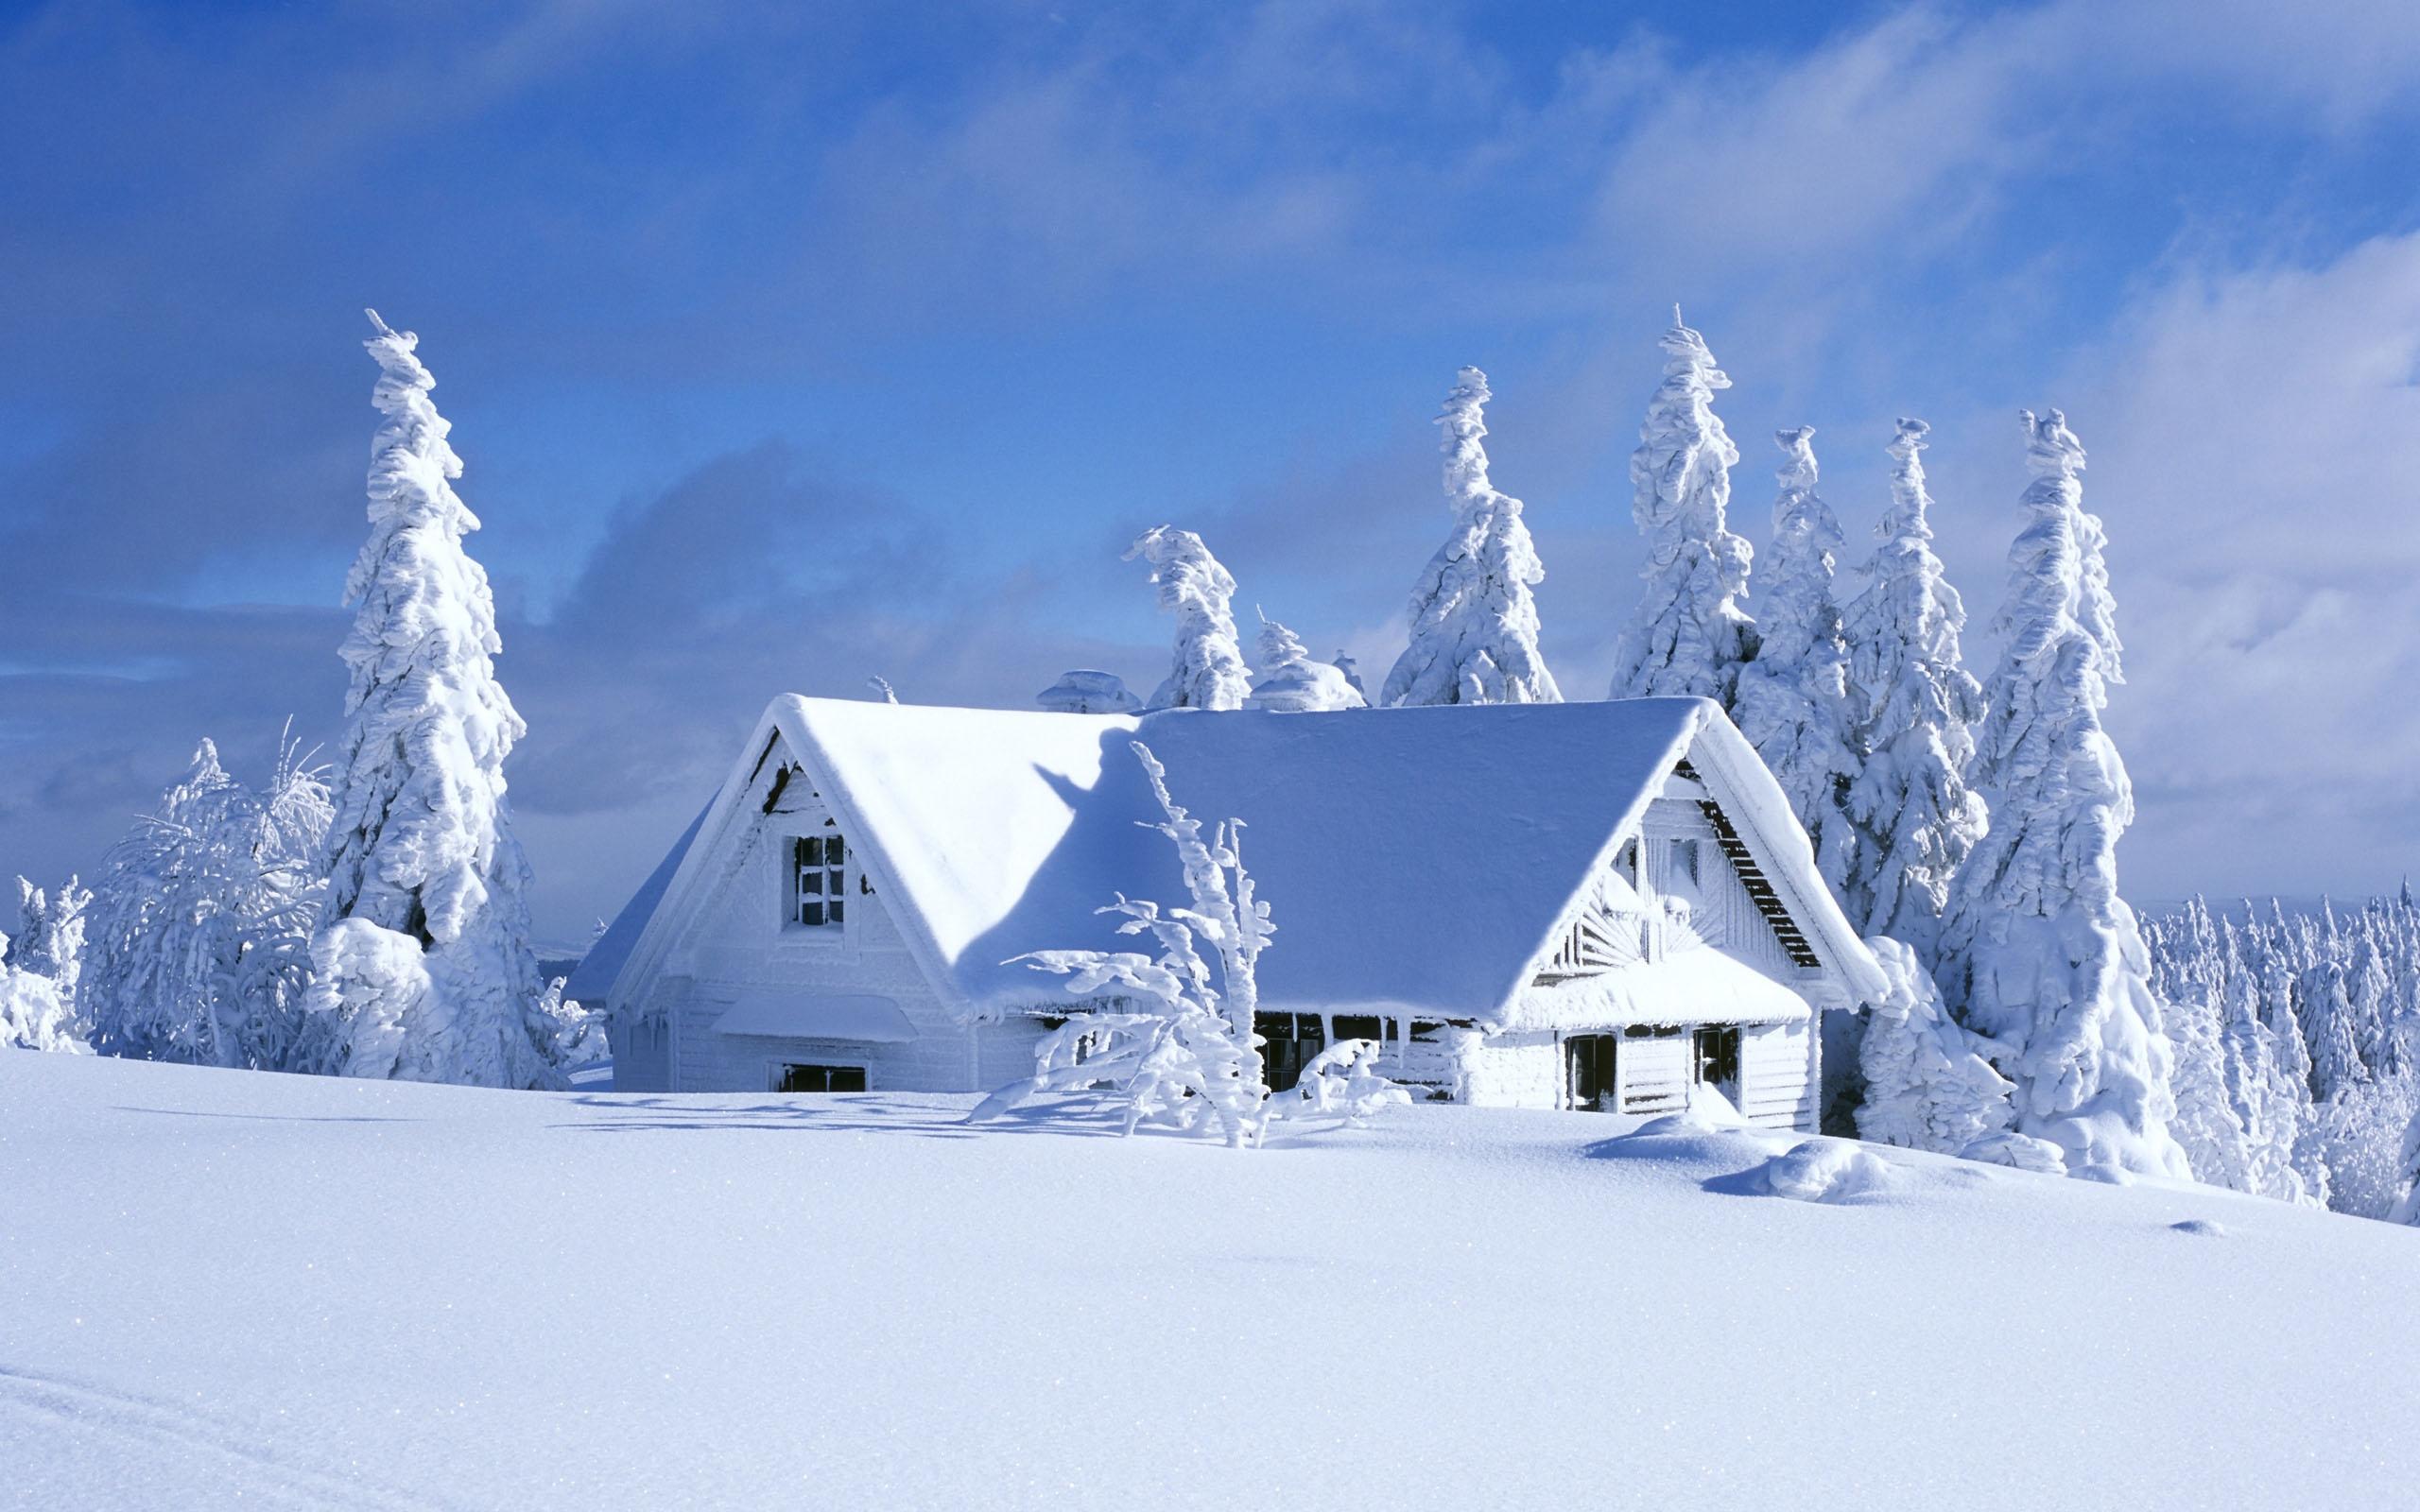 wallpaper winter wallpaper hd best winter wallpapers best winter 2560x1600